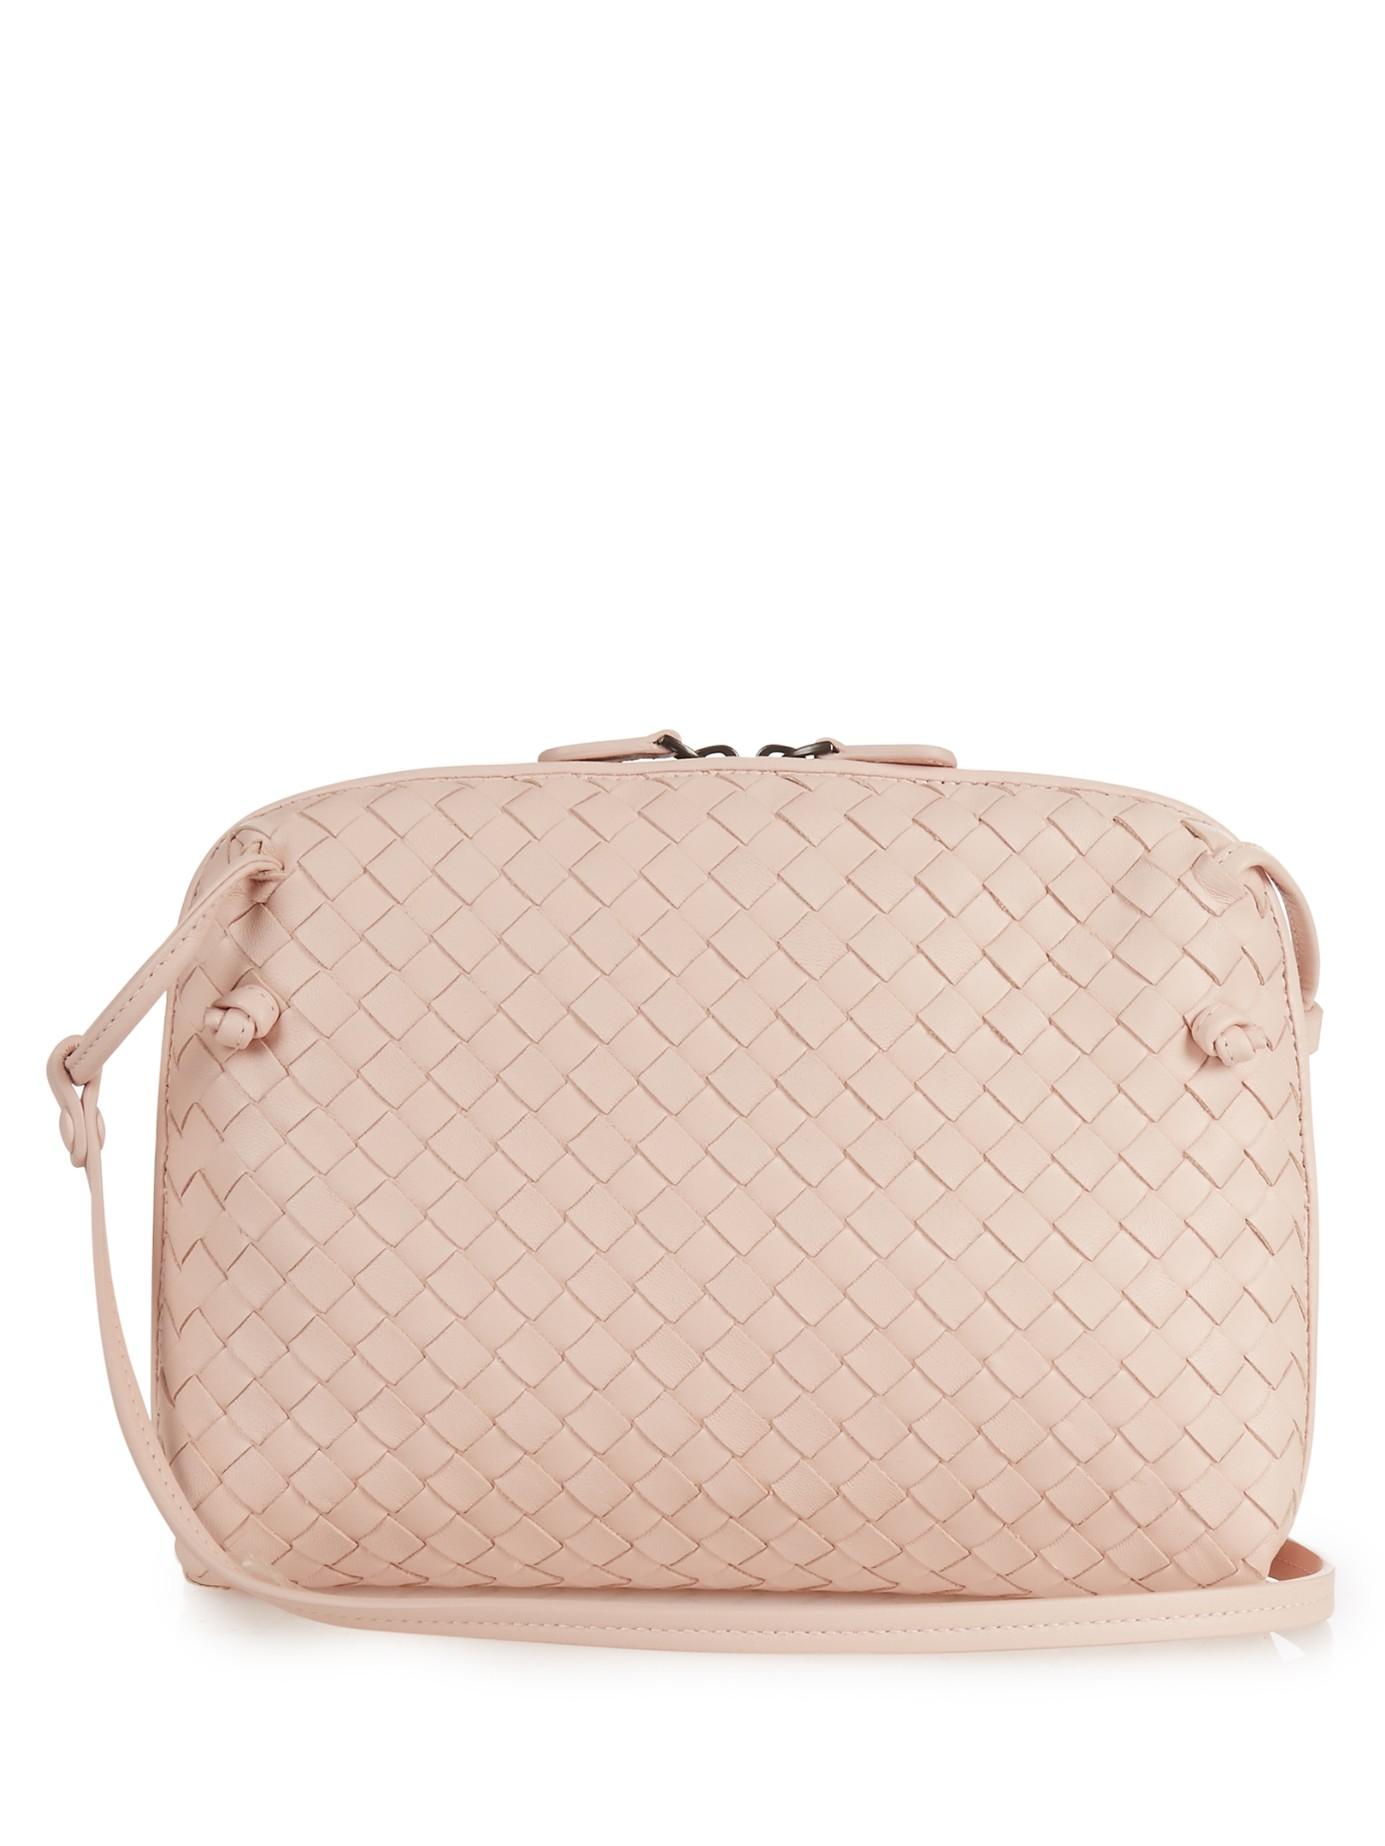 48f69a30db3 ... Shoulder Bag  best service e78b6 c31a7 Lyst - Bottega Veneta Nodini  Intrecciato Leather Cross-body ...